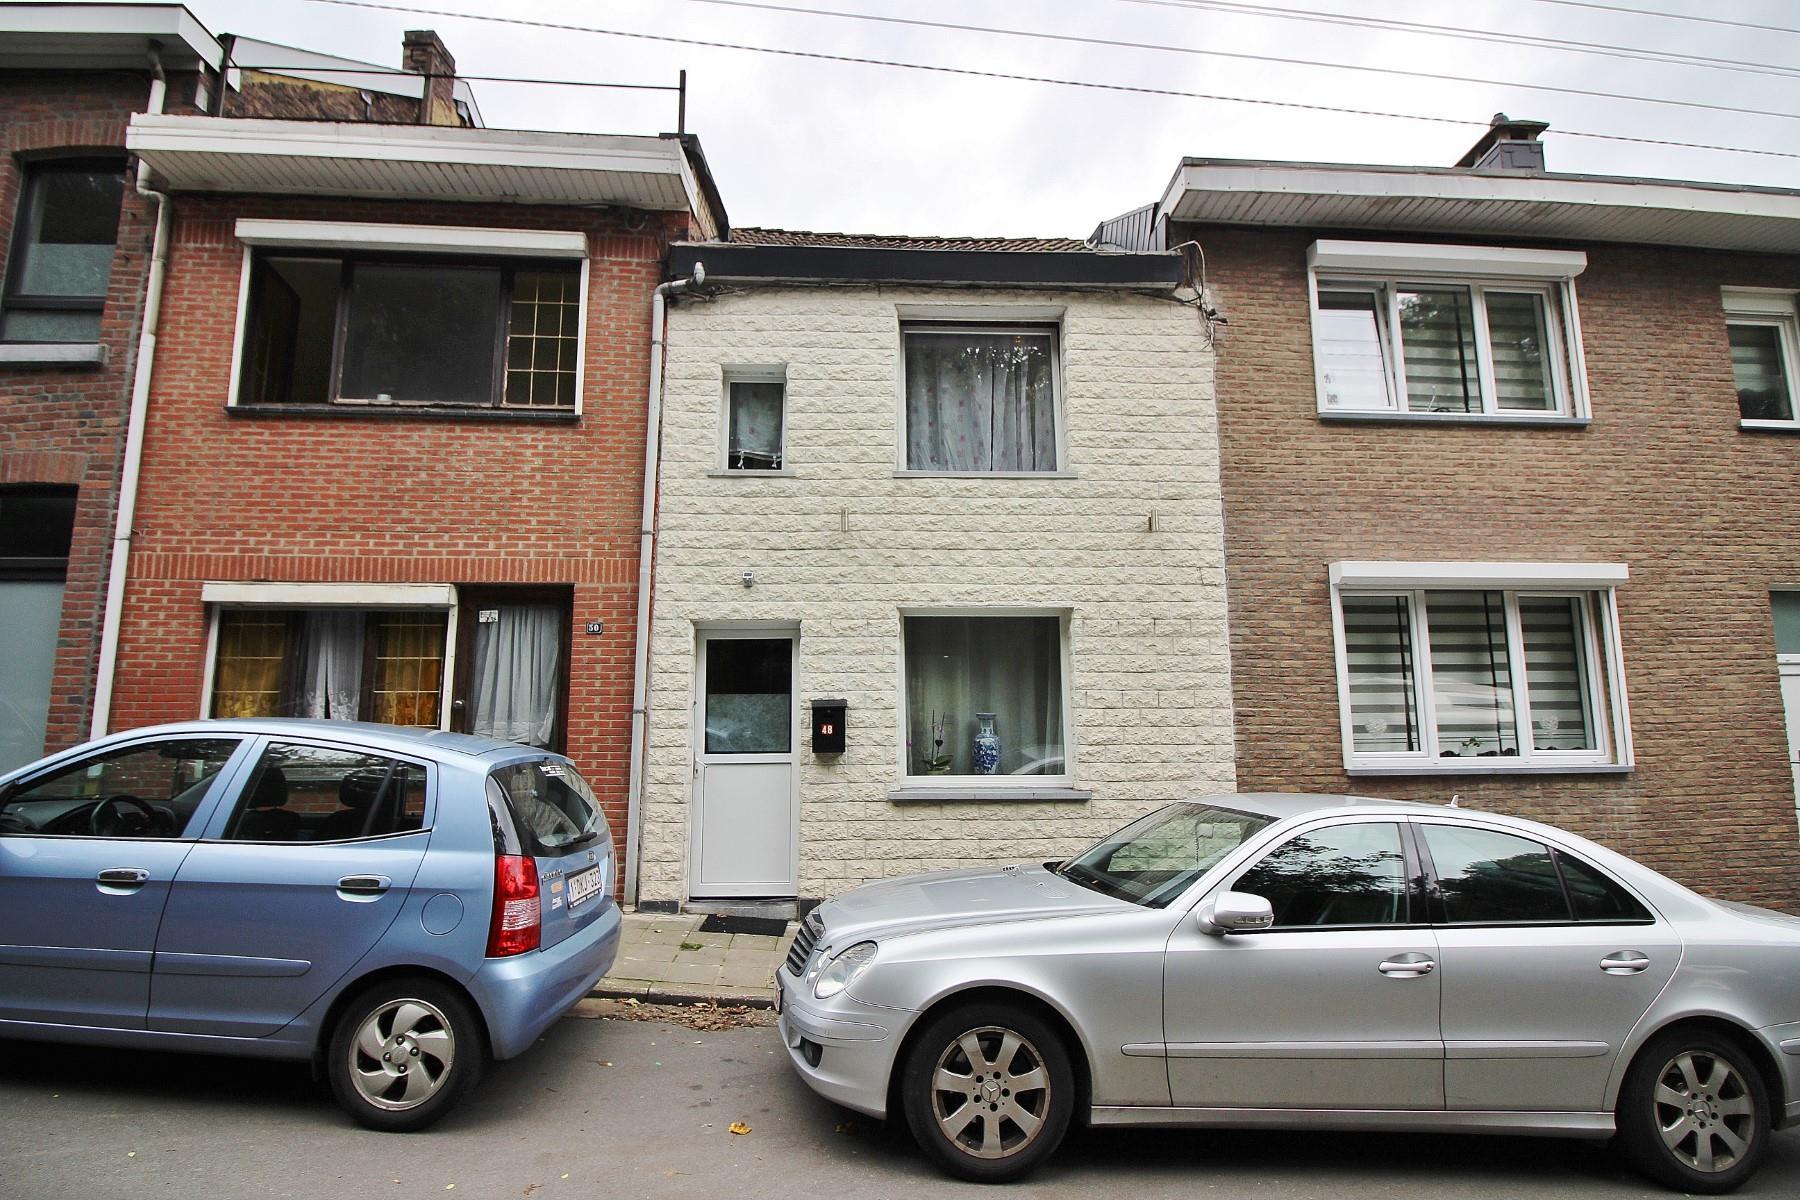 Maison - Seraing Jemeppesur-Meuse - #3879549-15